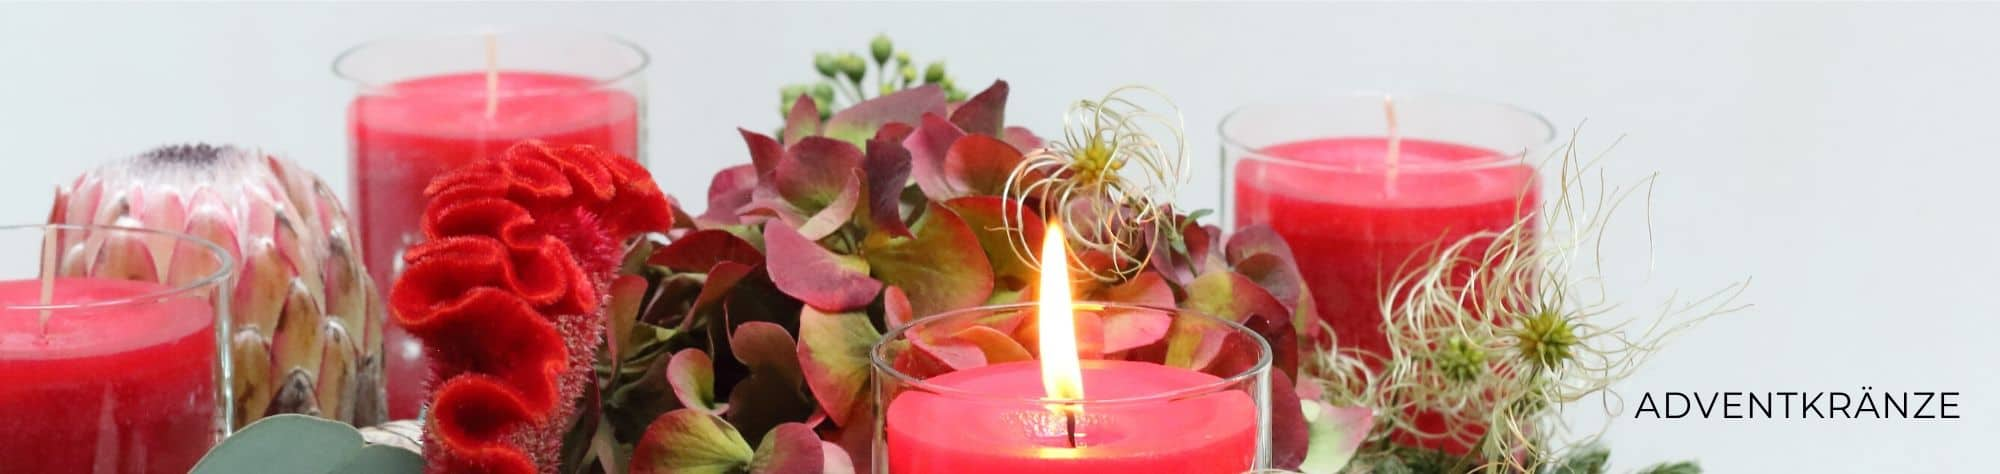 Adventkranz-Adventkränze-online-bestellen